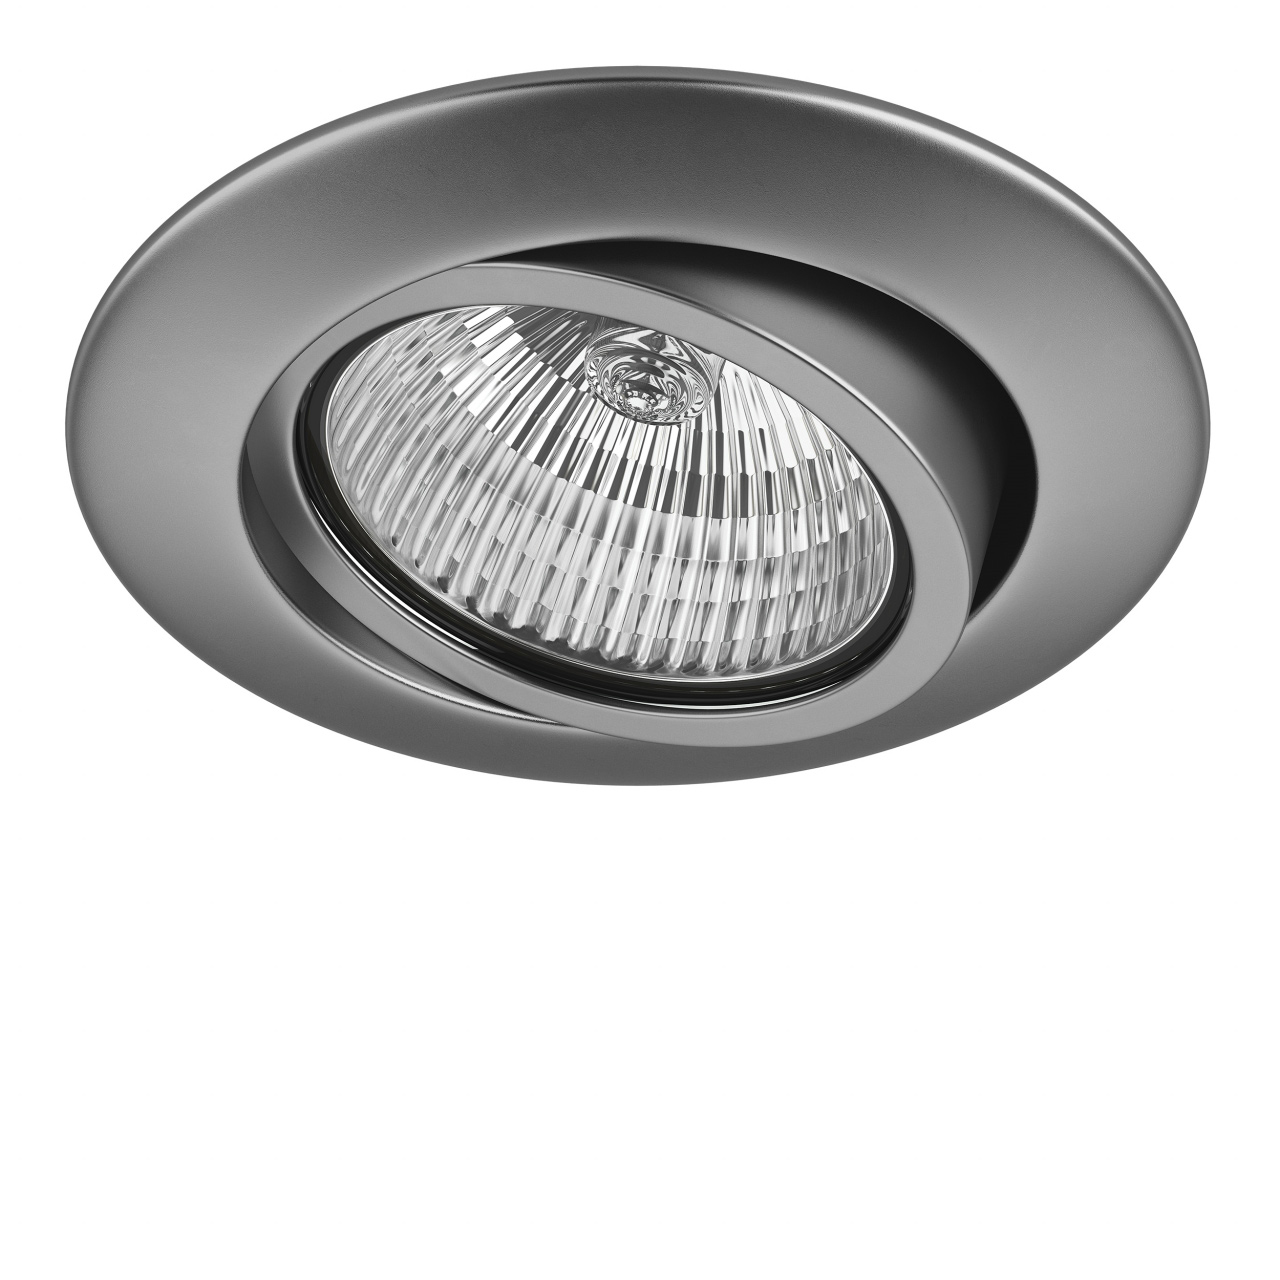 Светильник Teso ADJ MR16/ HP16 хром / матовый Lightstar 011089